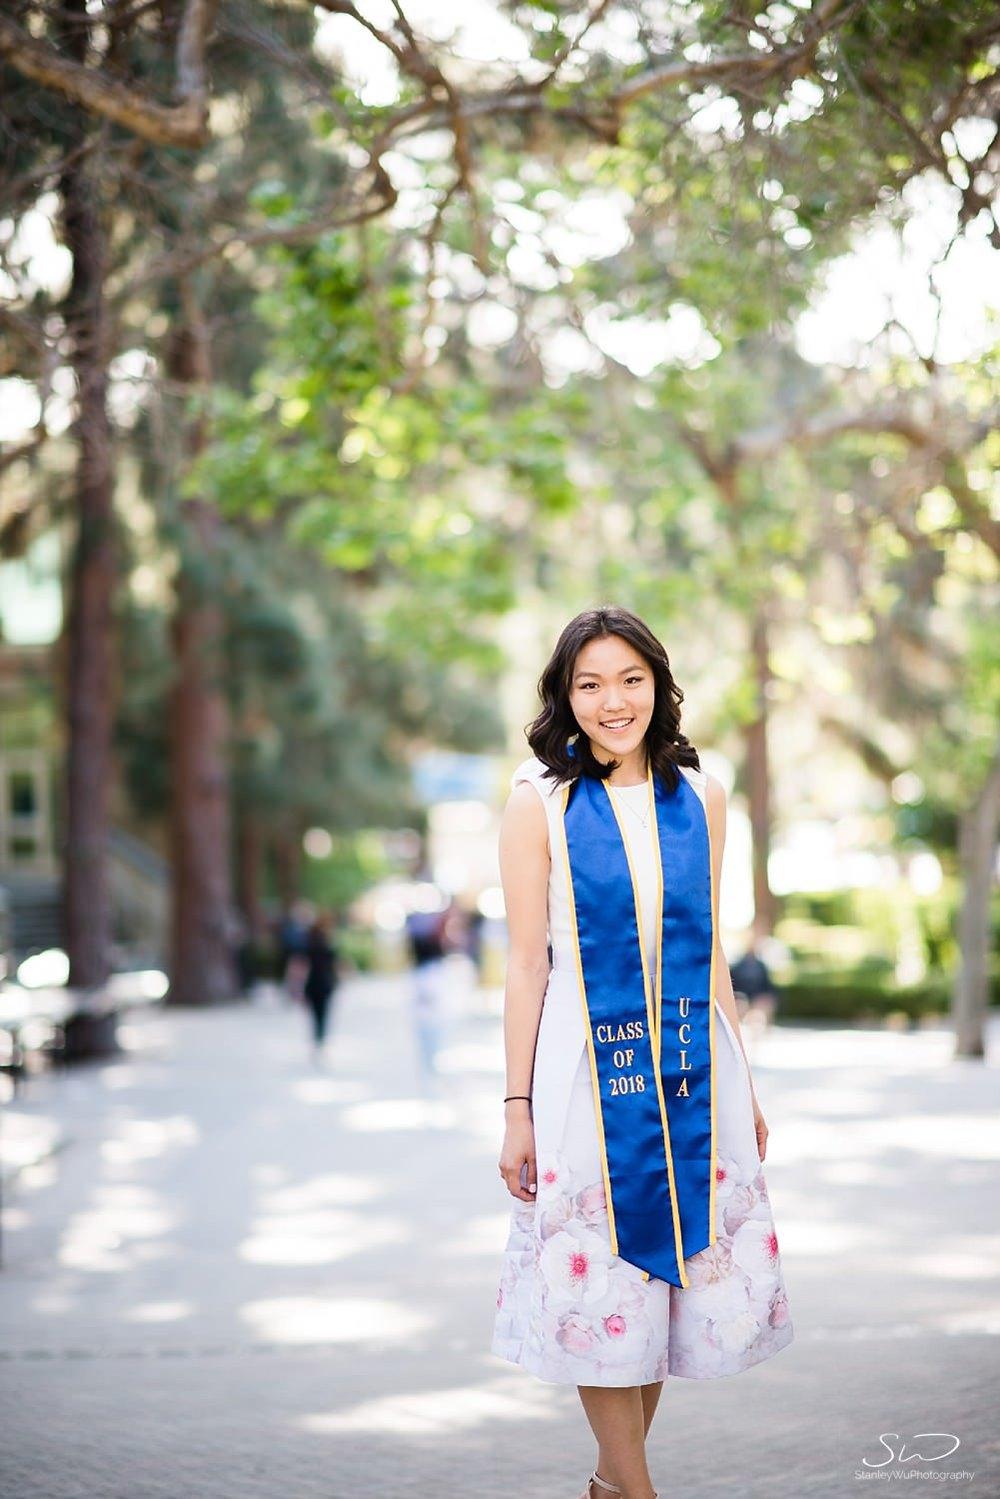 ucla-fashion-graduation-portrait-senior-session_0057.jpg